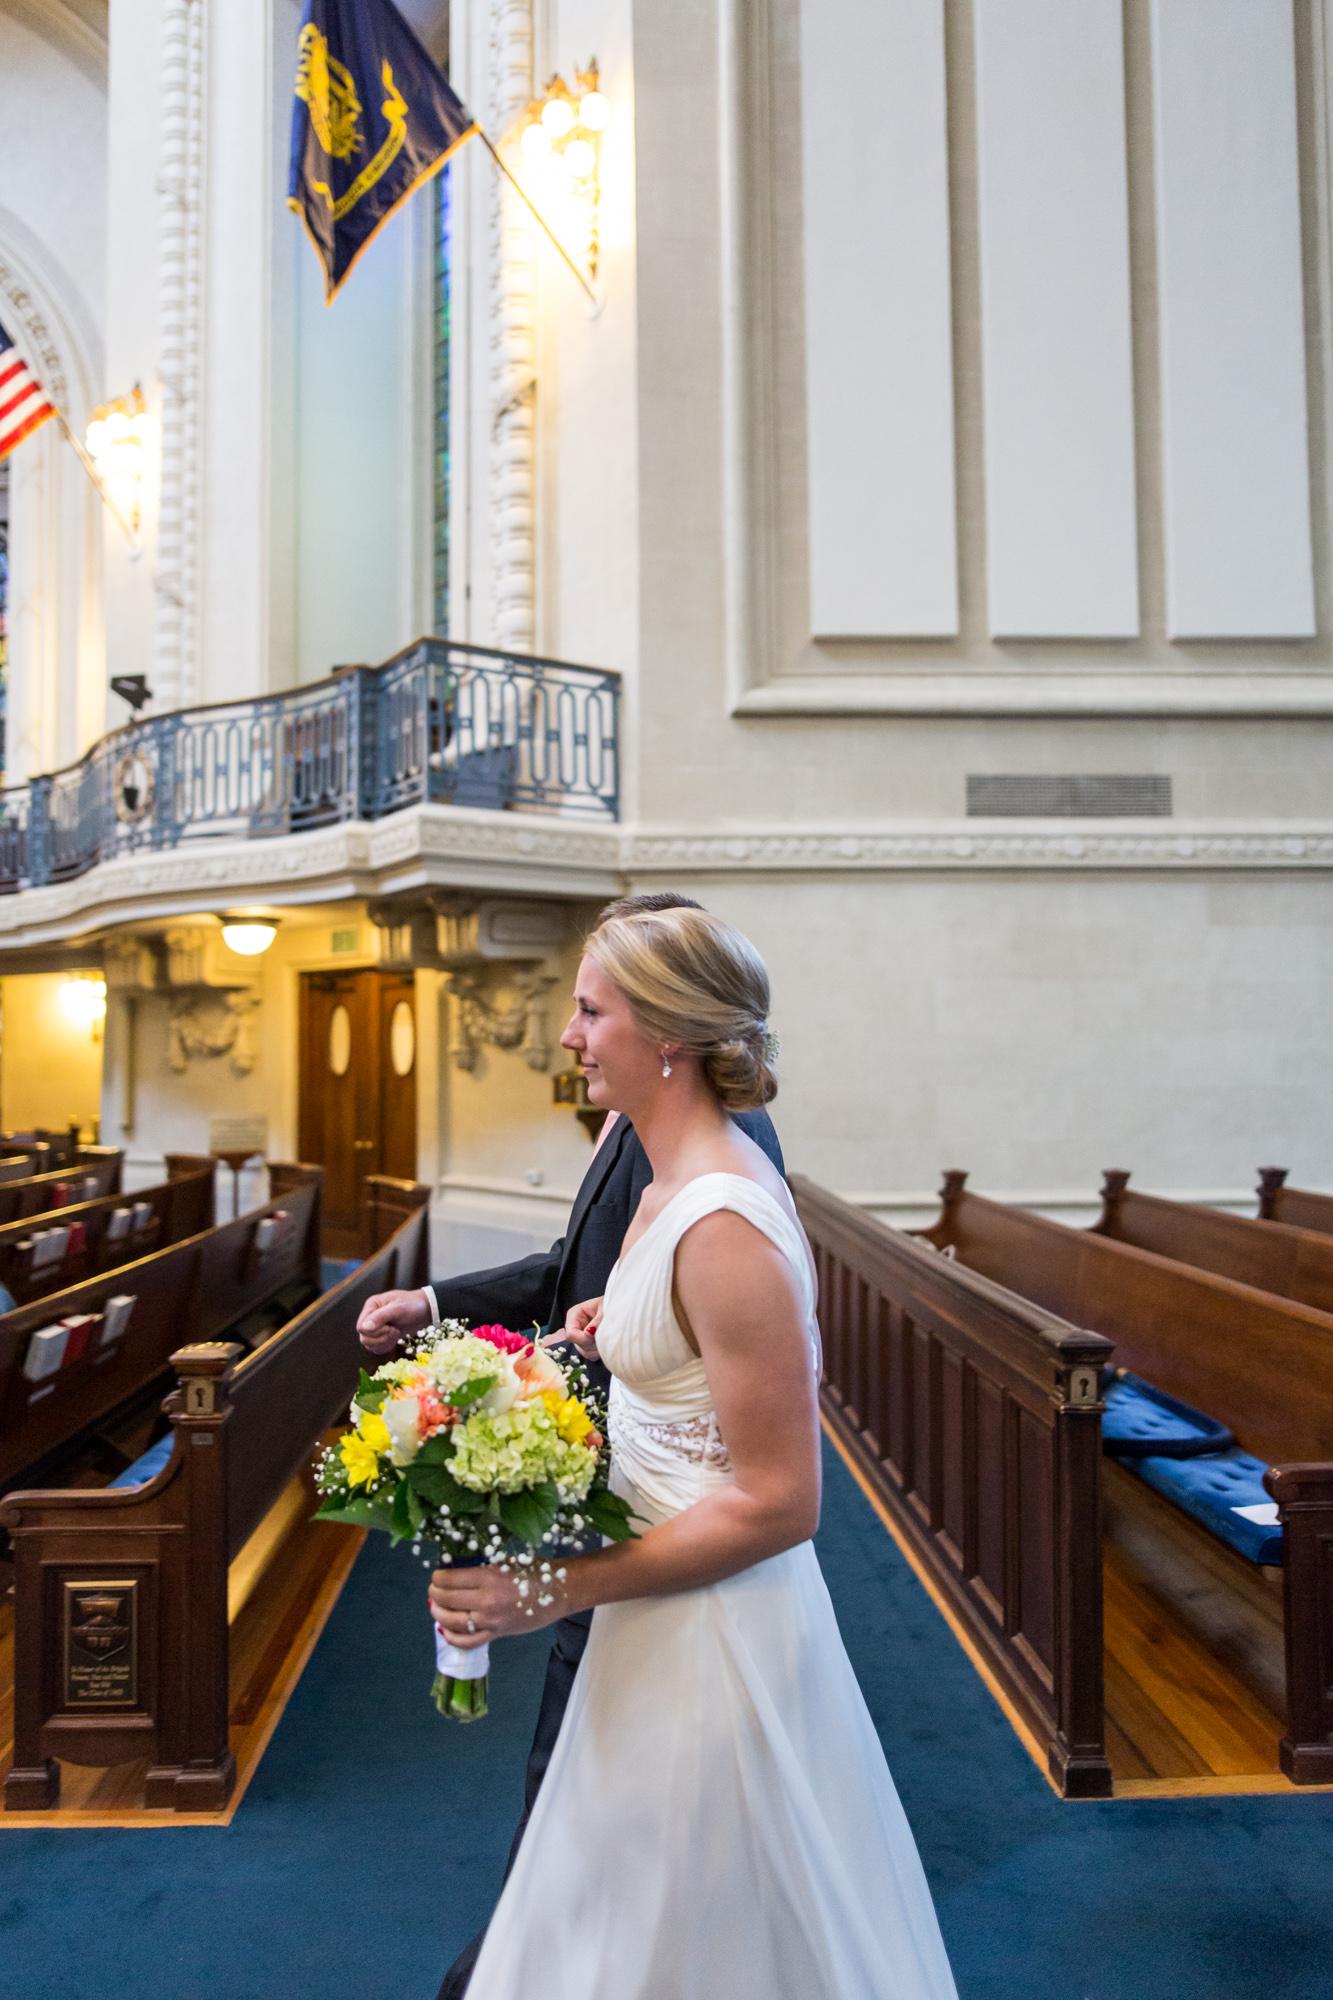 2017_05_27_ray_caroline_naval_wedding-6377.jpg